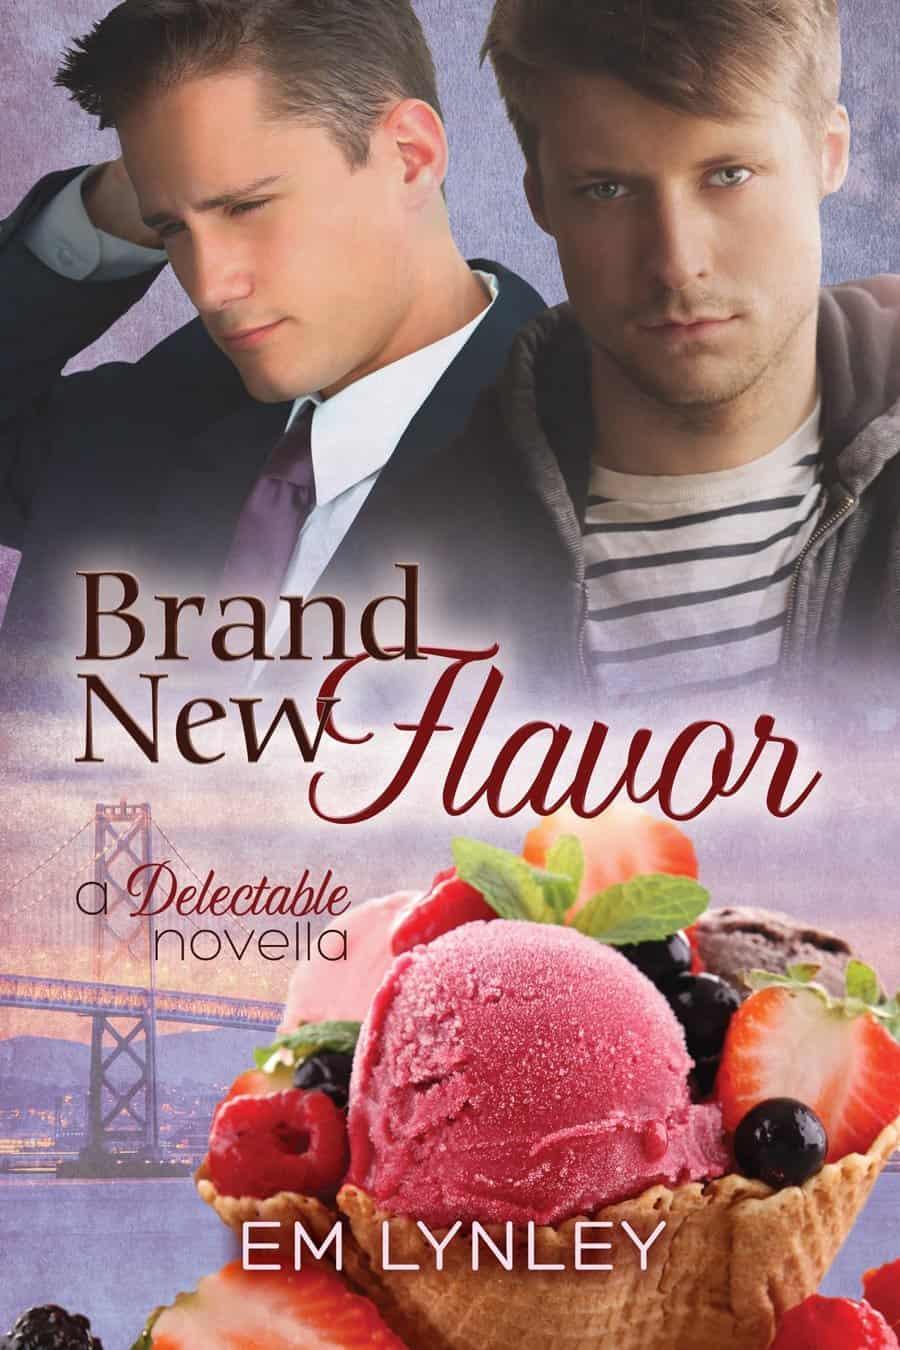 Brand New Flavor by EM Lynley